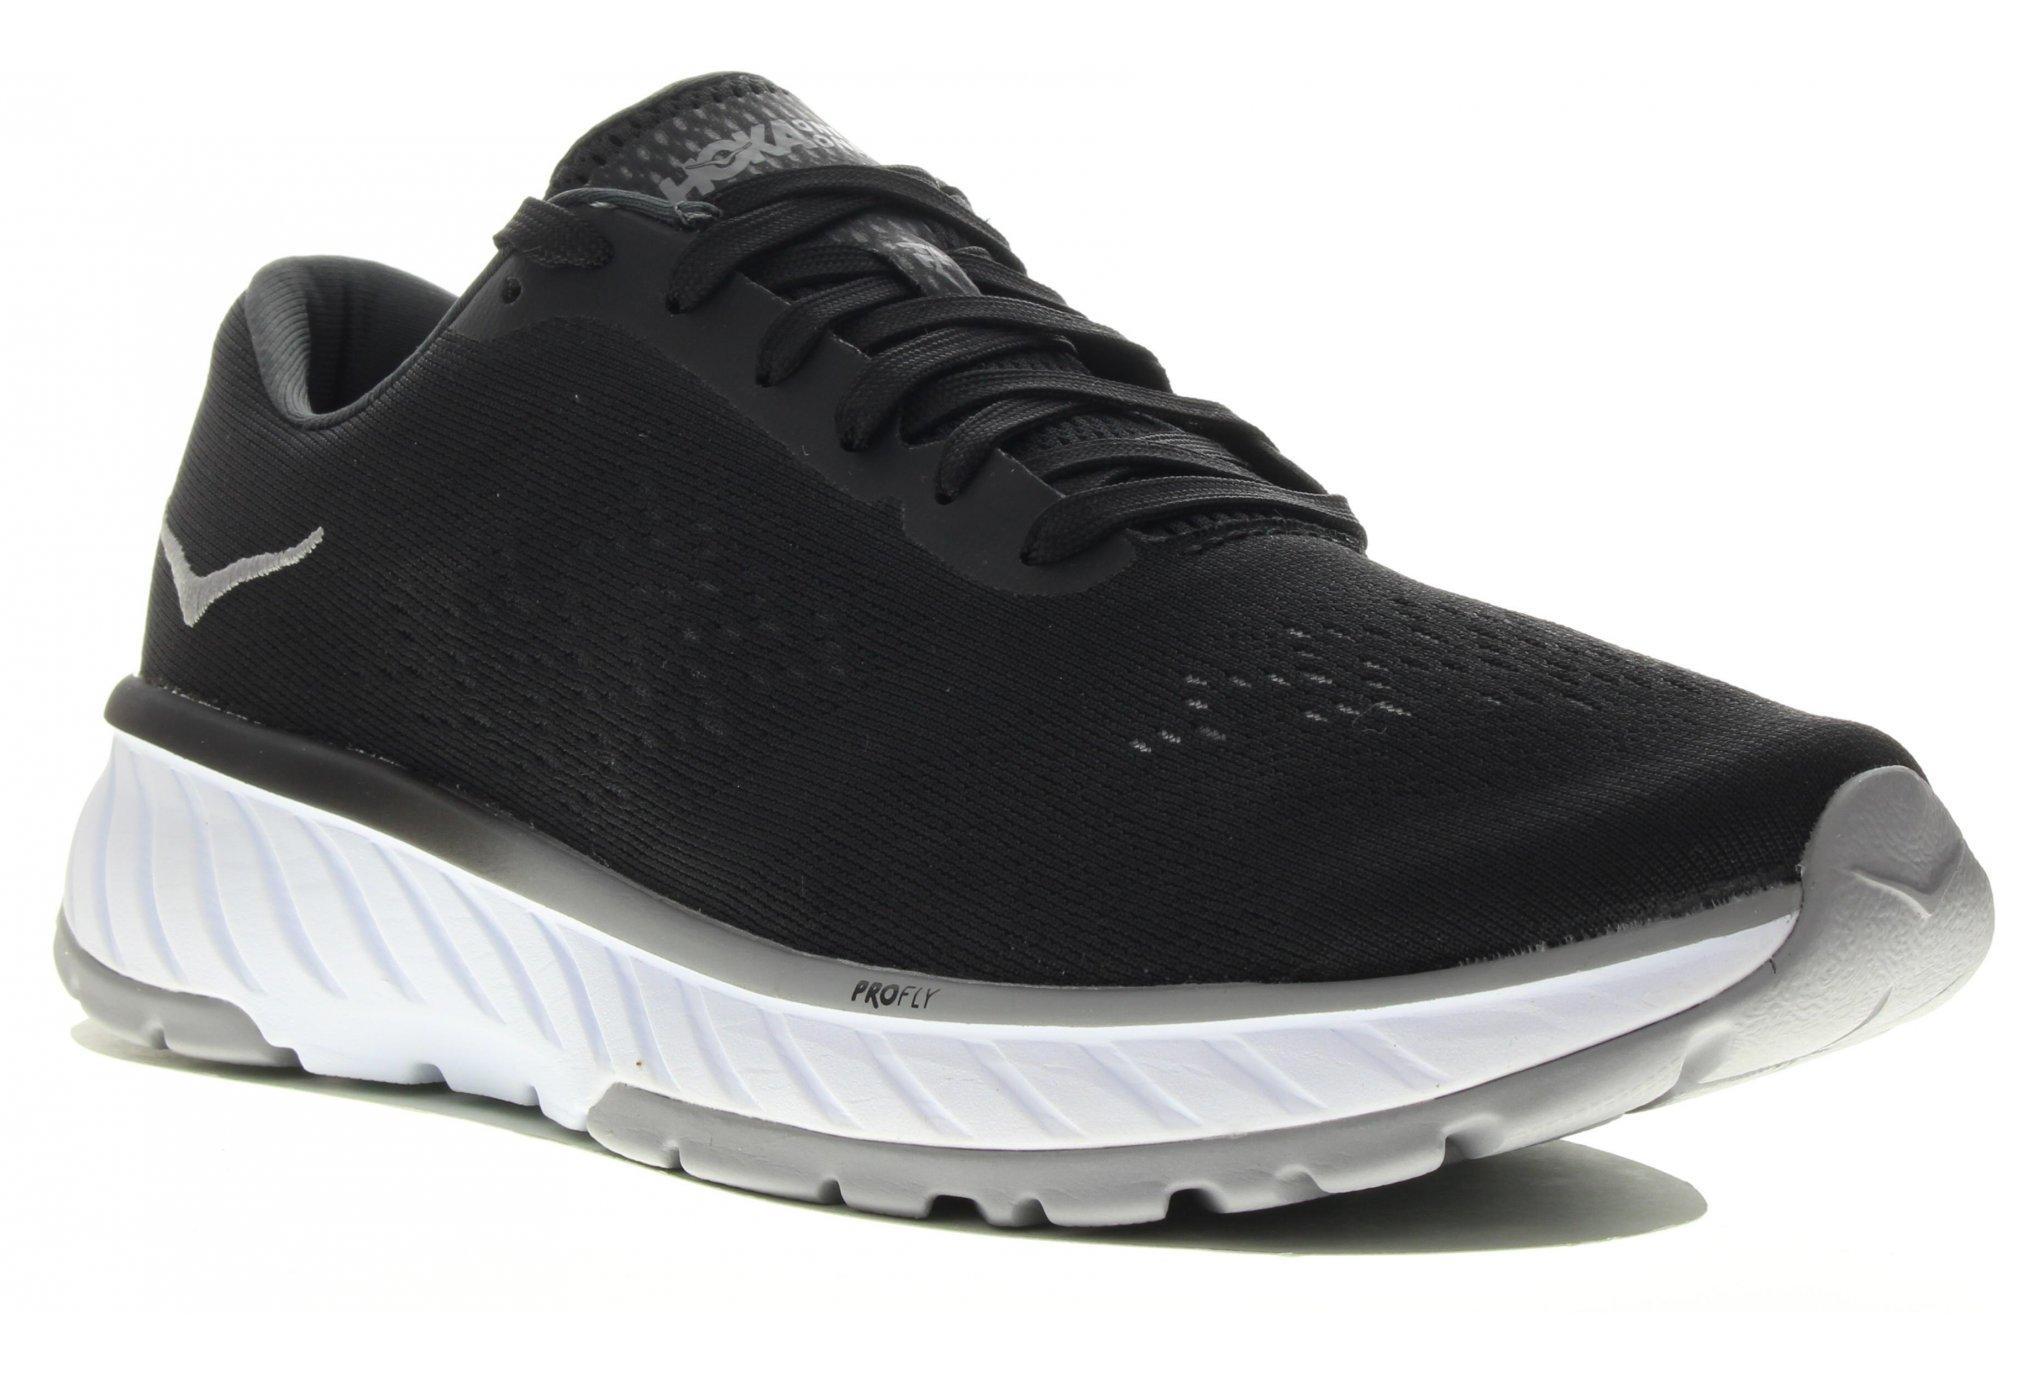 Hoka One one cavu 2 w chaussures running femme